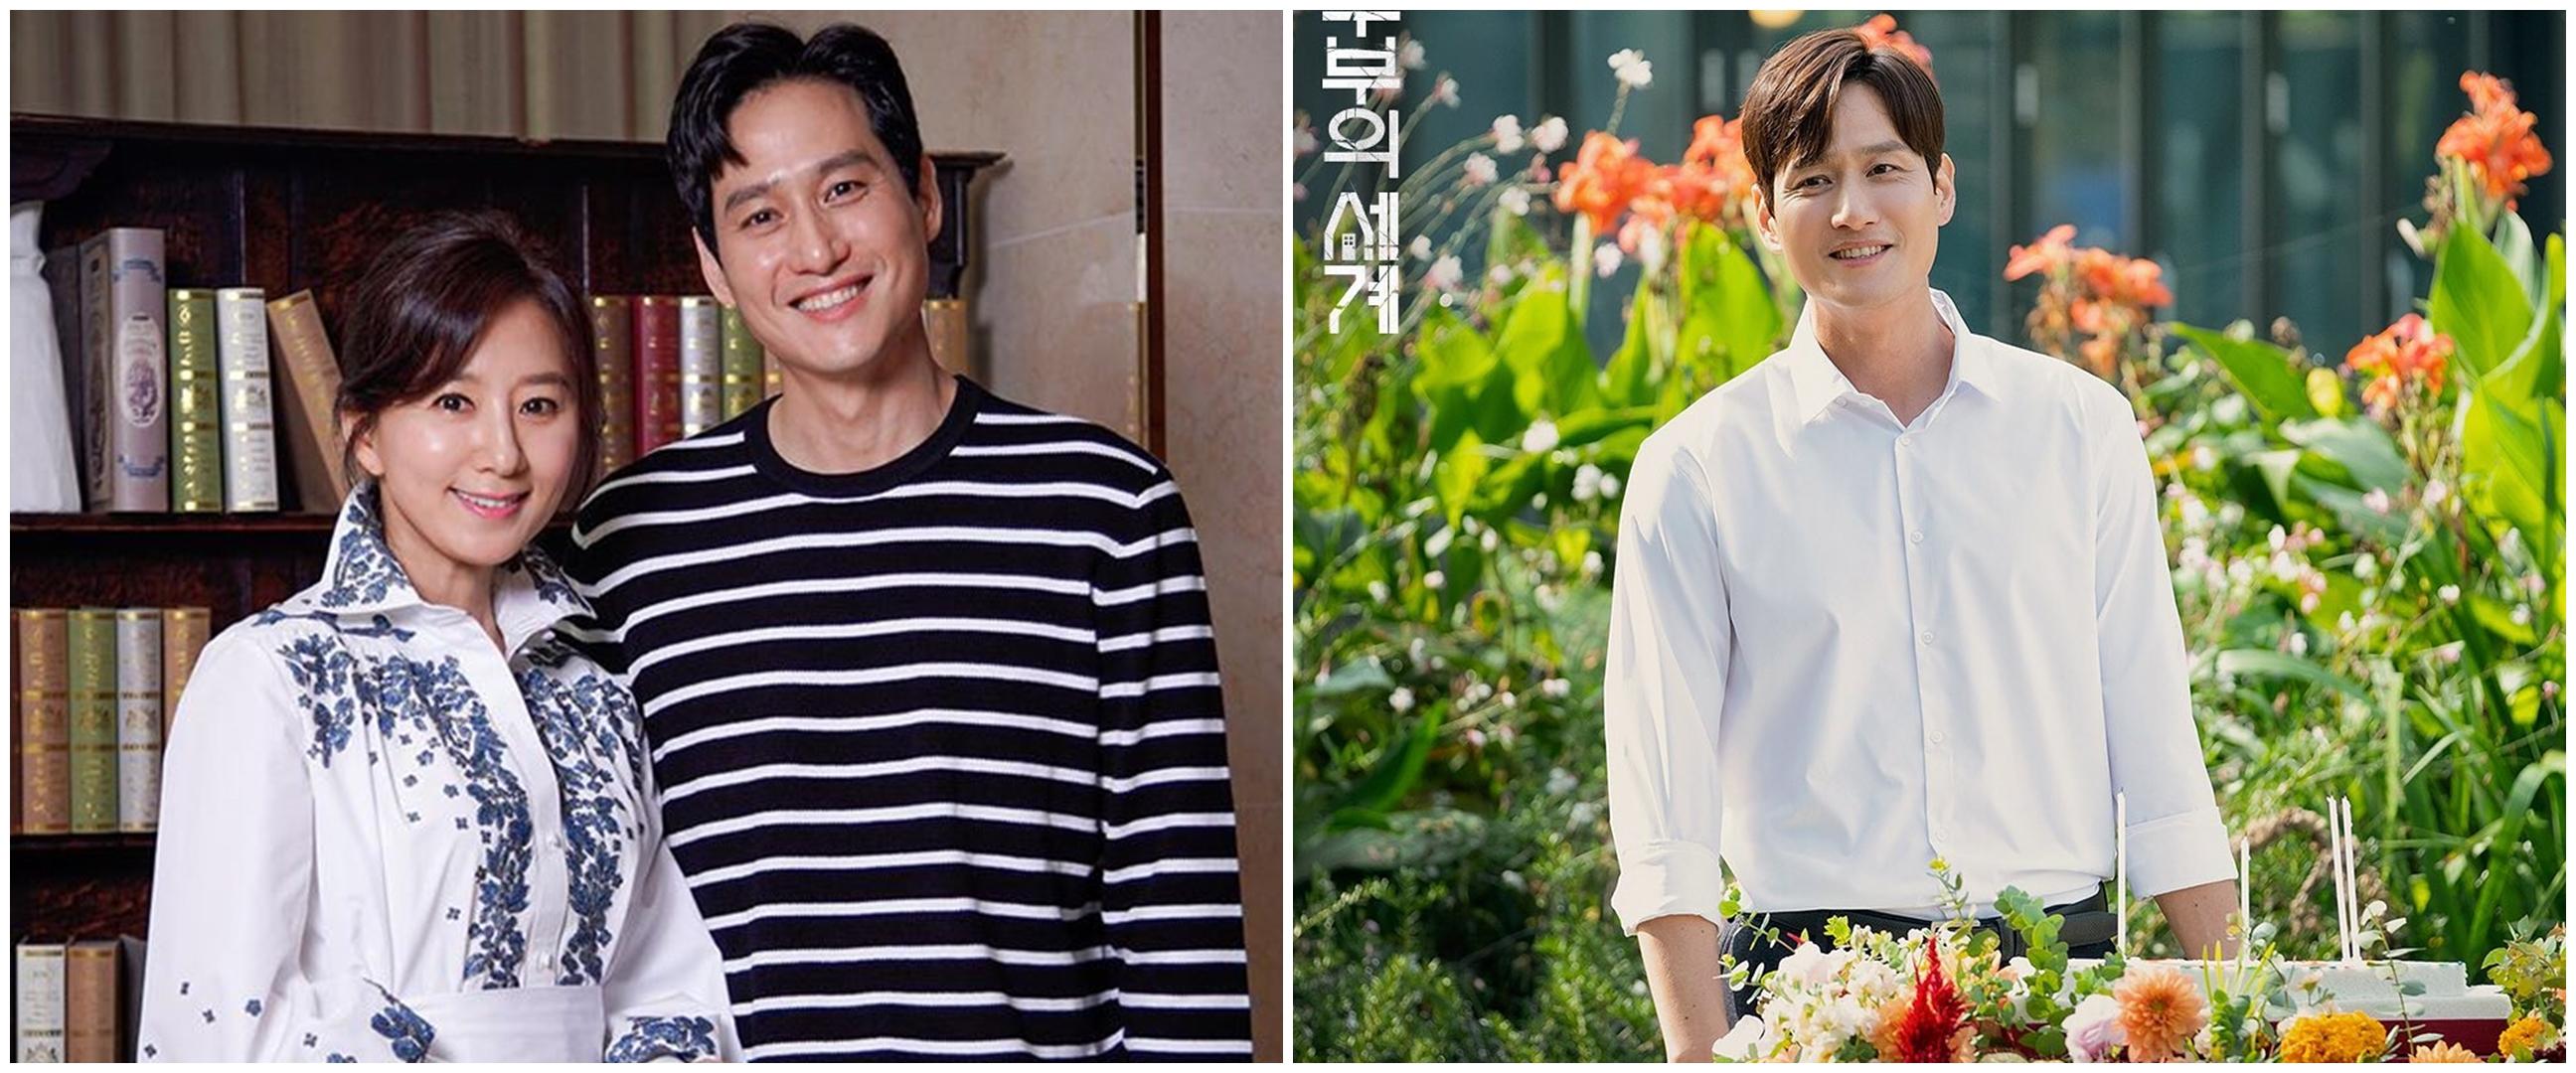 7 Potret masa muda Park Hae-joon, aktor The World of the Married